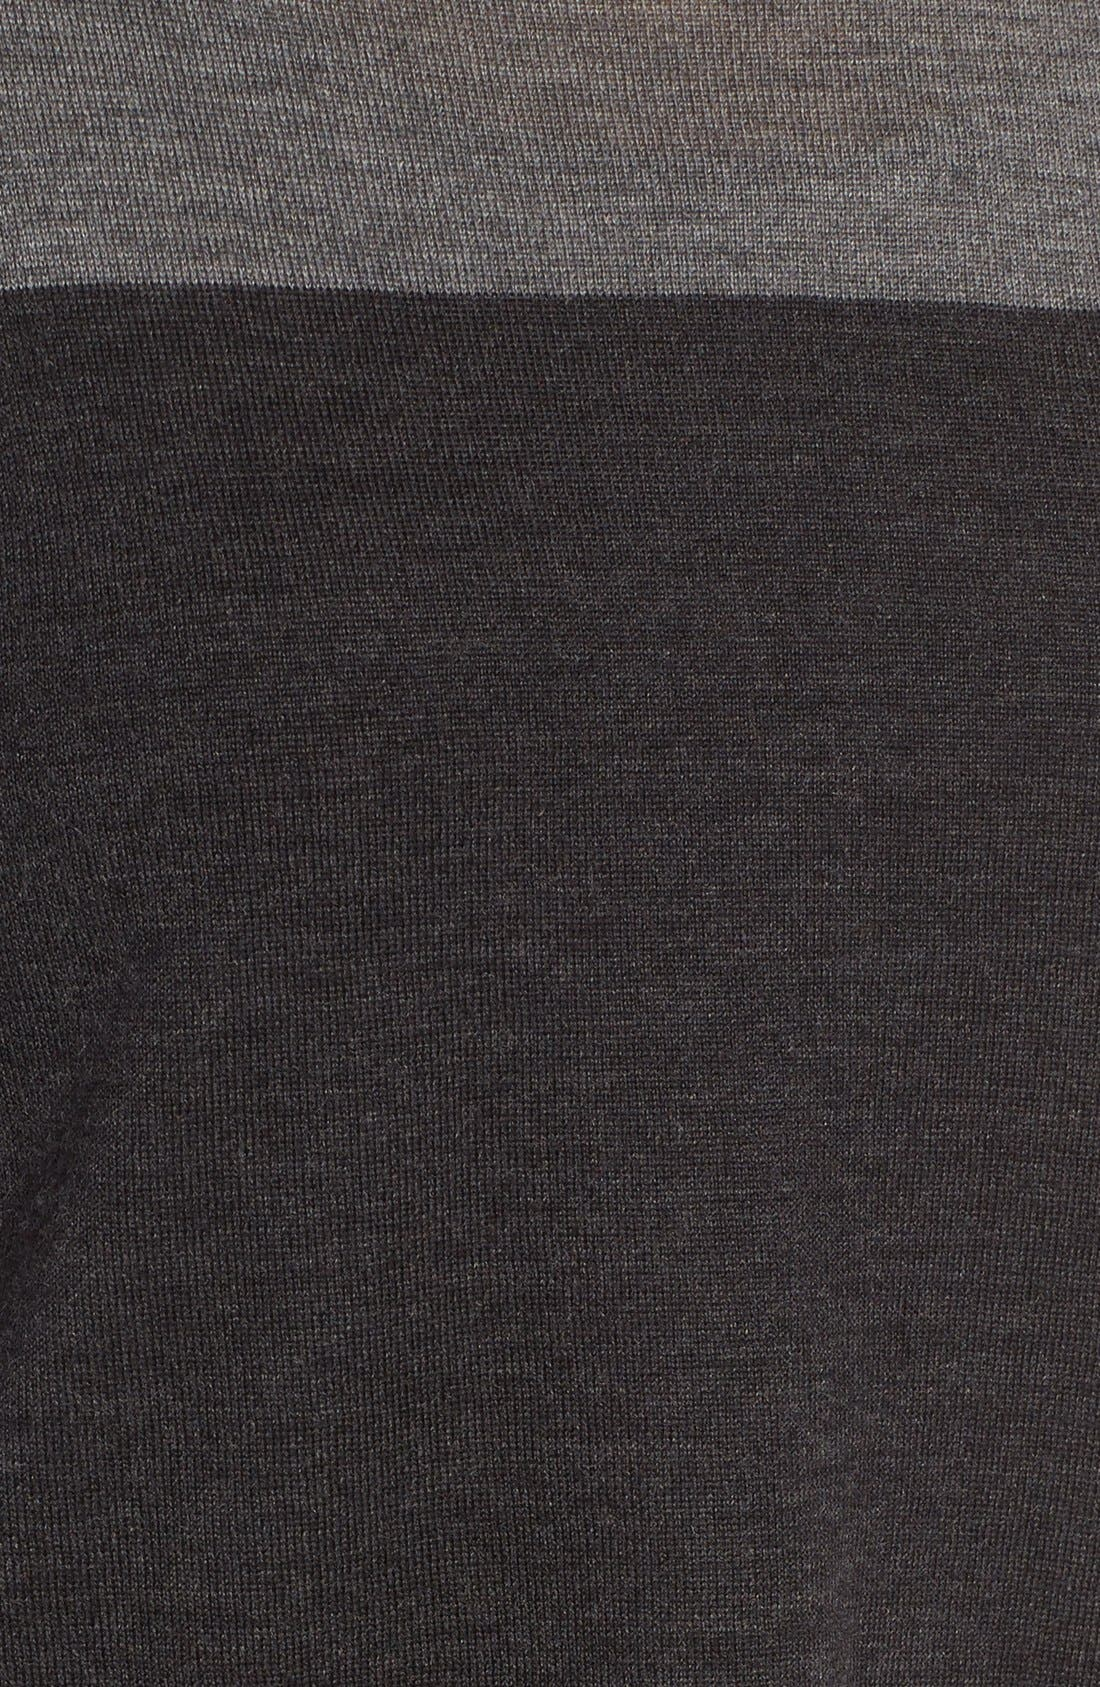 Alternate Image 5  - Eileen Fisher Colorblock Merino Wool Sweater (Regular & Petite)